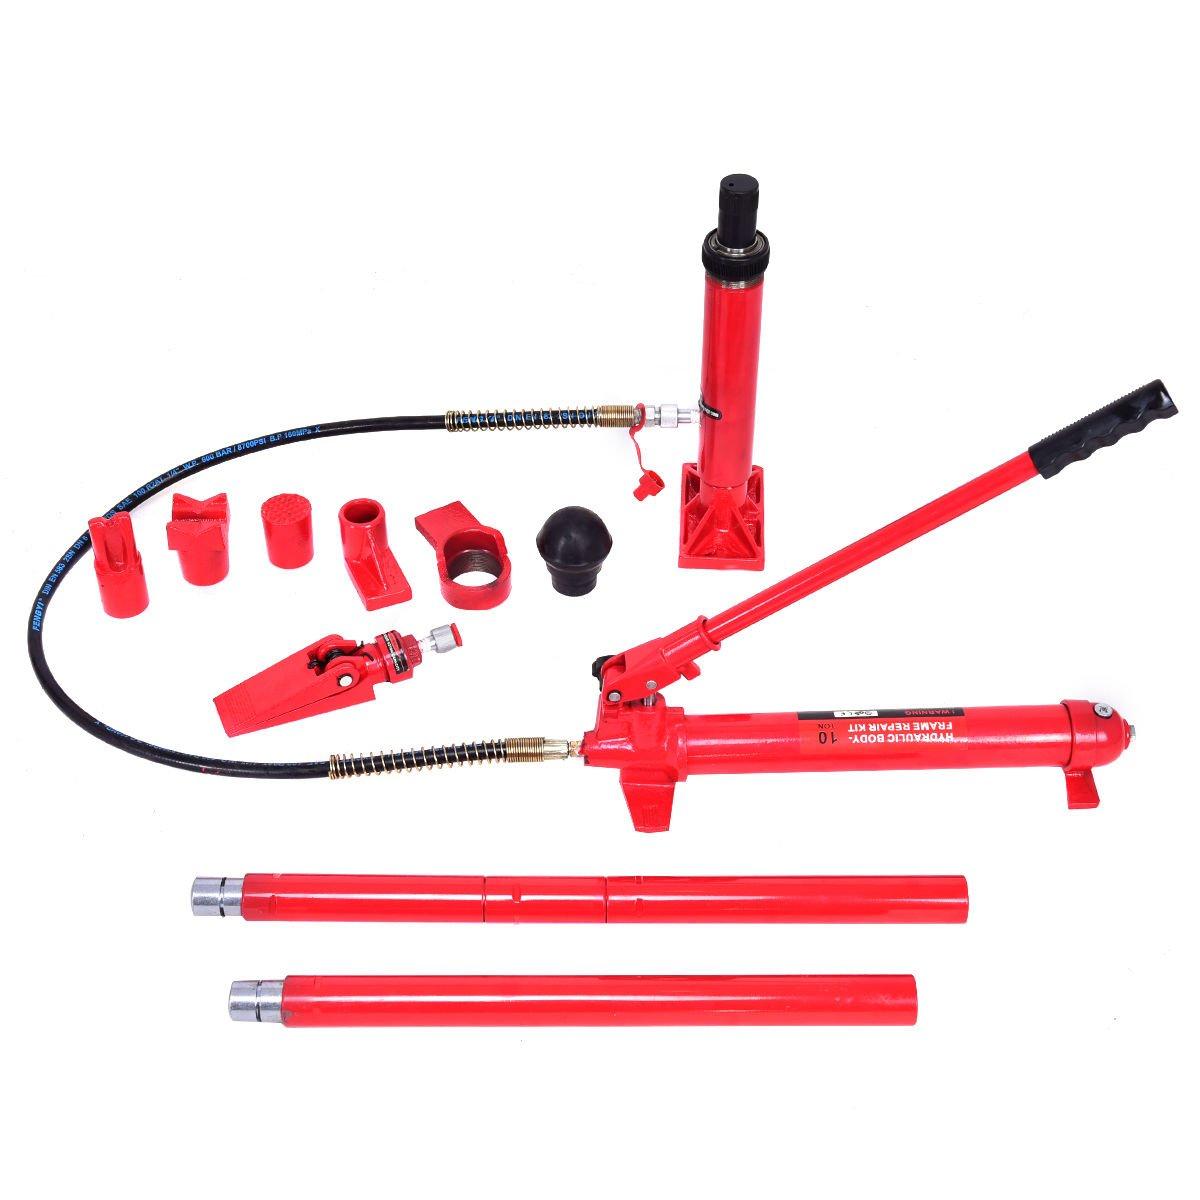 Goplus Porta Power Hydraulic Jack Auto Body Frame Repair Kit Shop Tool Lift Ram w/Carrying Case, 10 Ton Capacity by Goplus (Image #3)